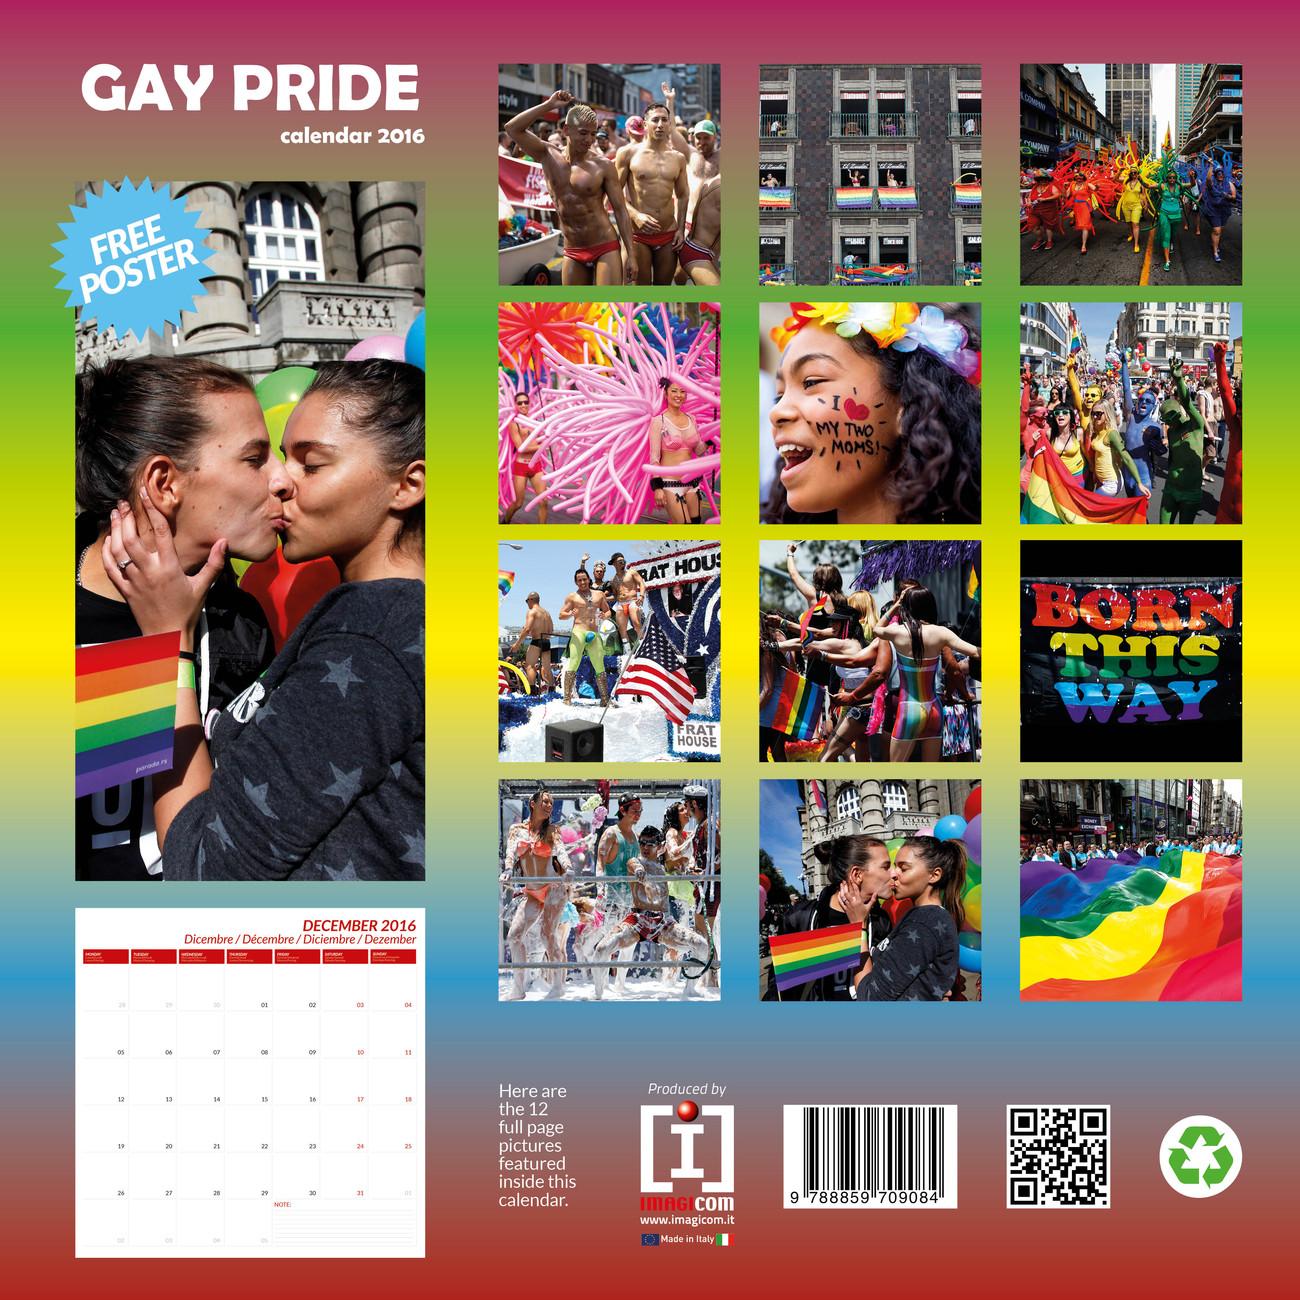 Gay Pride 2020 Calendar Gay Pride   Calendars 2020 on UKposters/Abposters.com